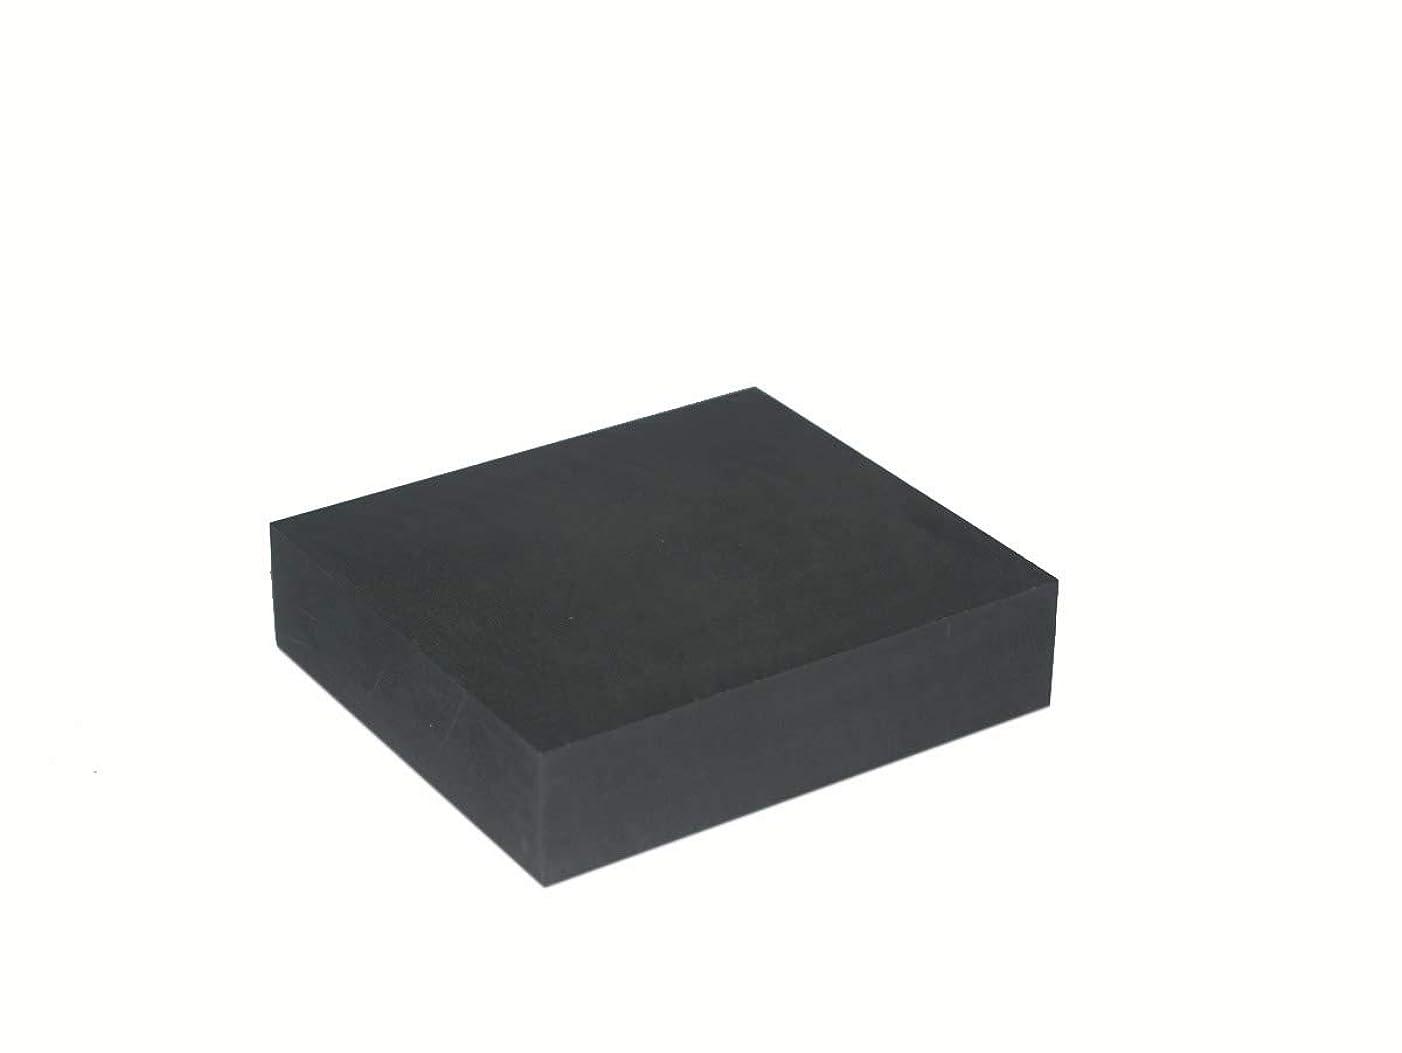 Graphite Ingot EDM Graphite Plate Smooth Polished Surface(70MMx80MMx20MM)